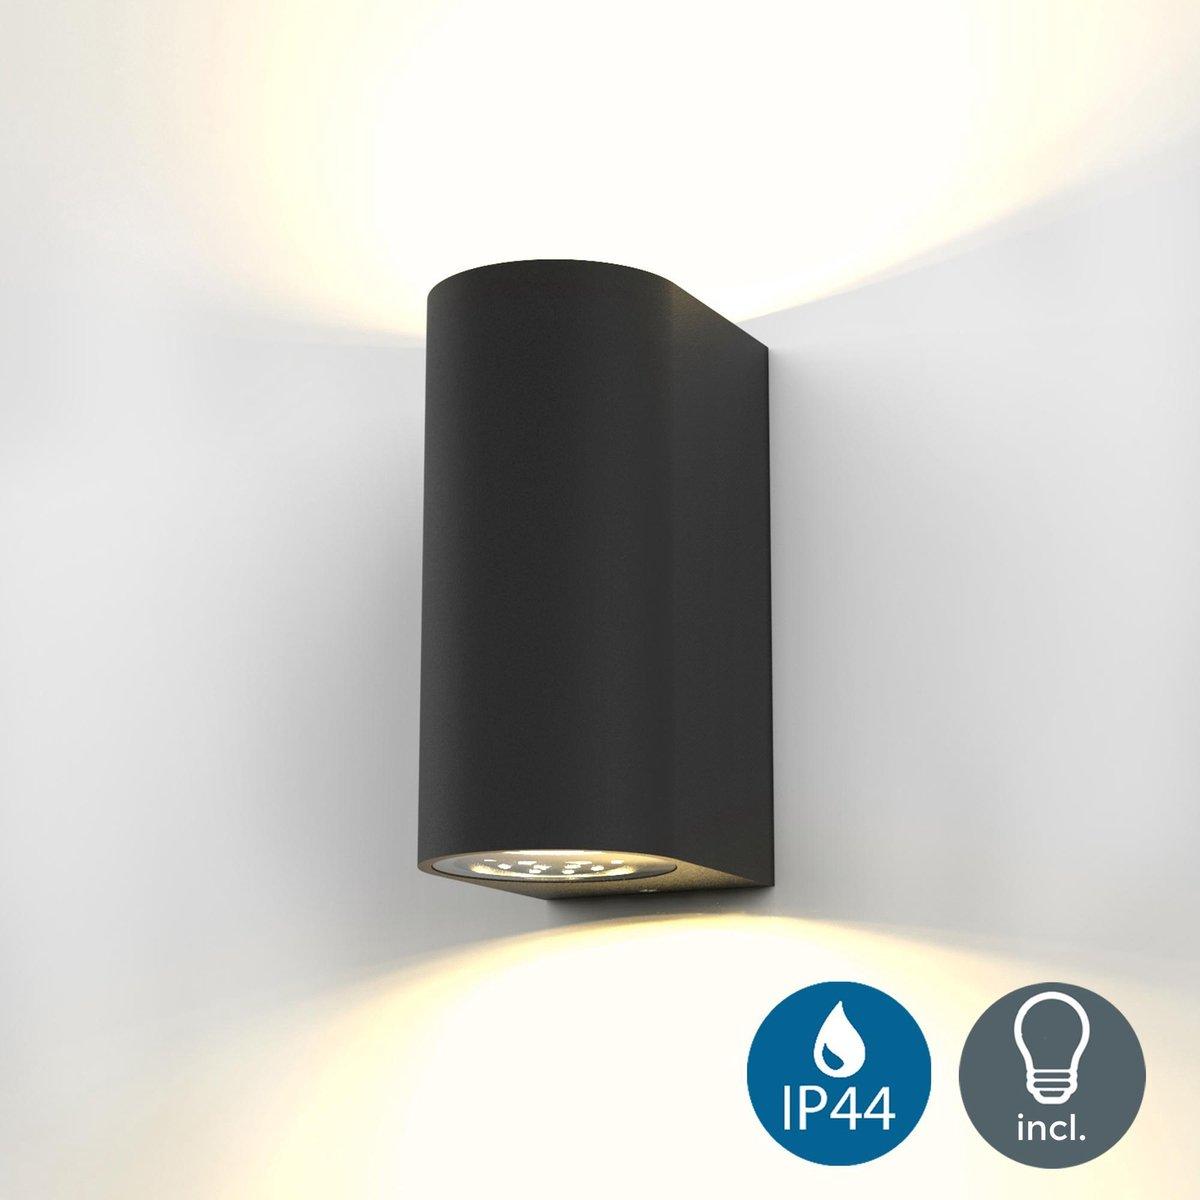 B.K.Licht - Buitenlamp - wandlamp - buitenverlichting - zwart - Ip44 - badkamer - 3.000K - 400Lm - 5